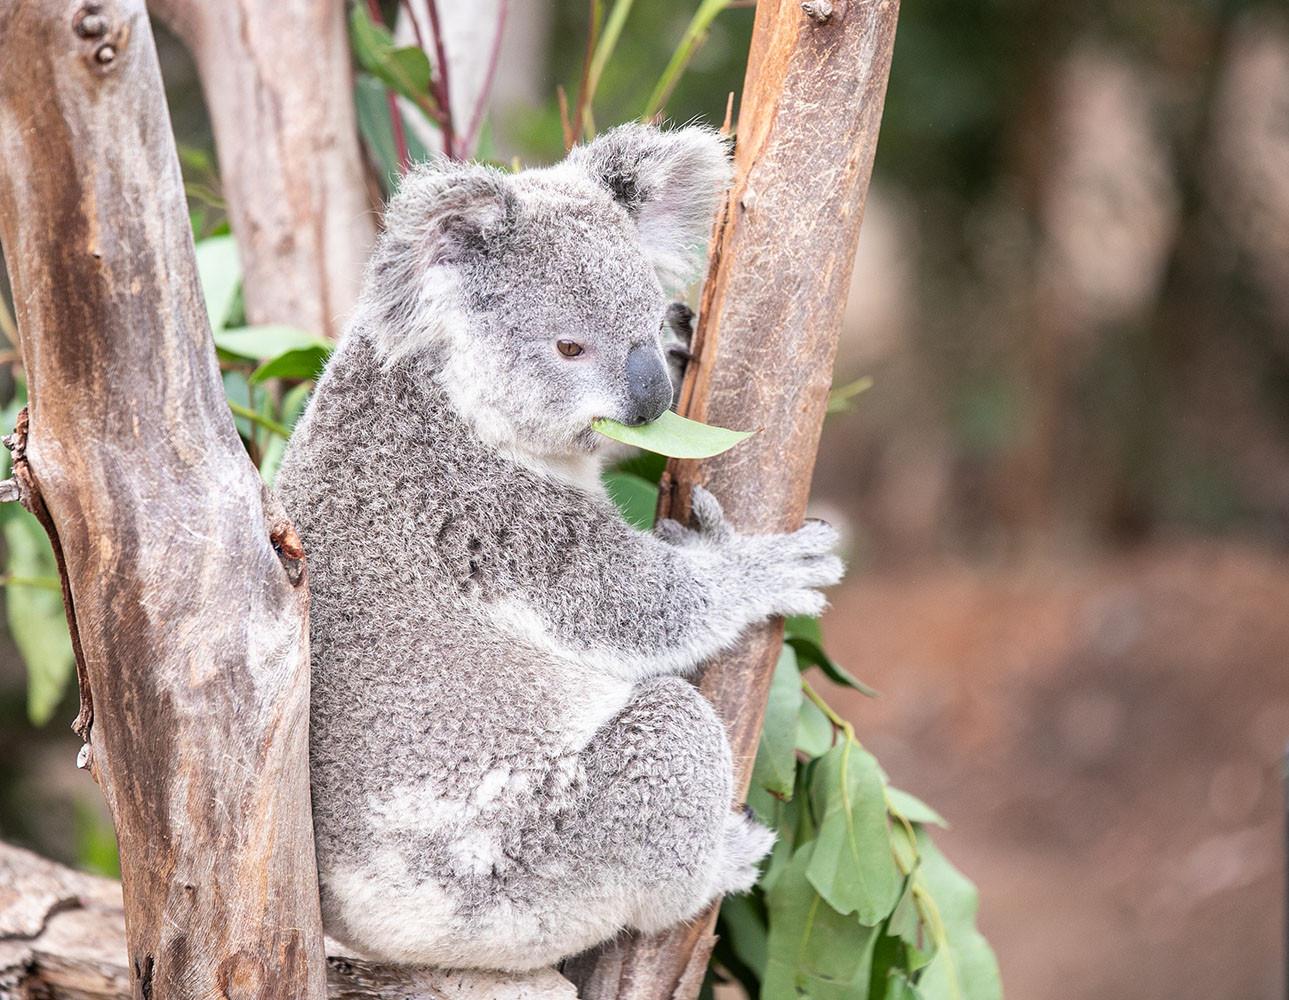 Koala 1000x1000px